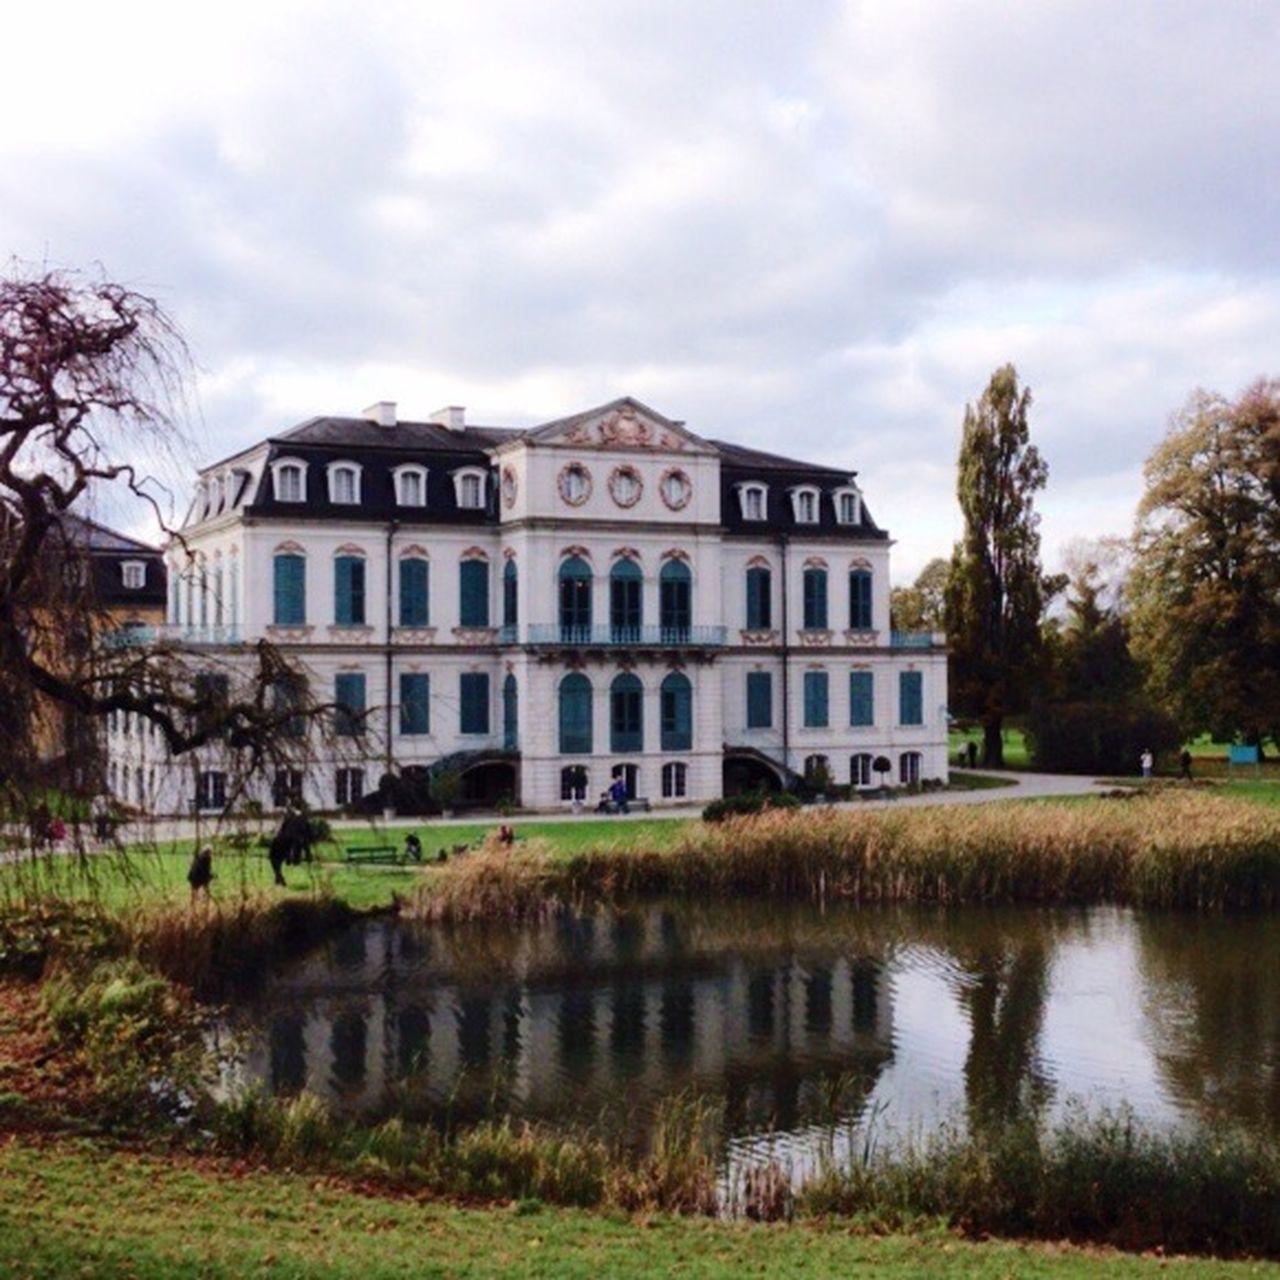 Castle Schloss in Hessen Deutschland Water Reflections